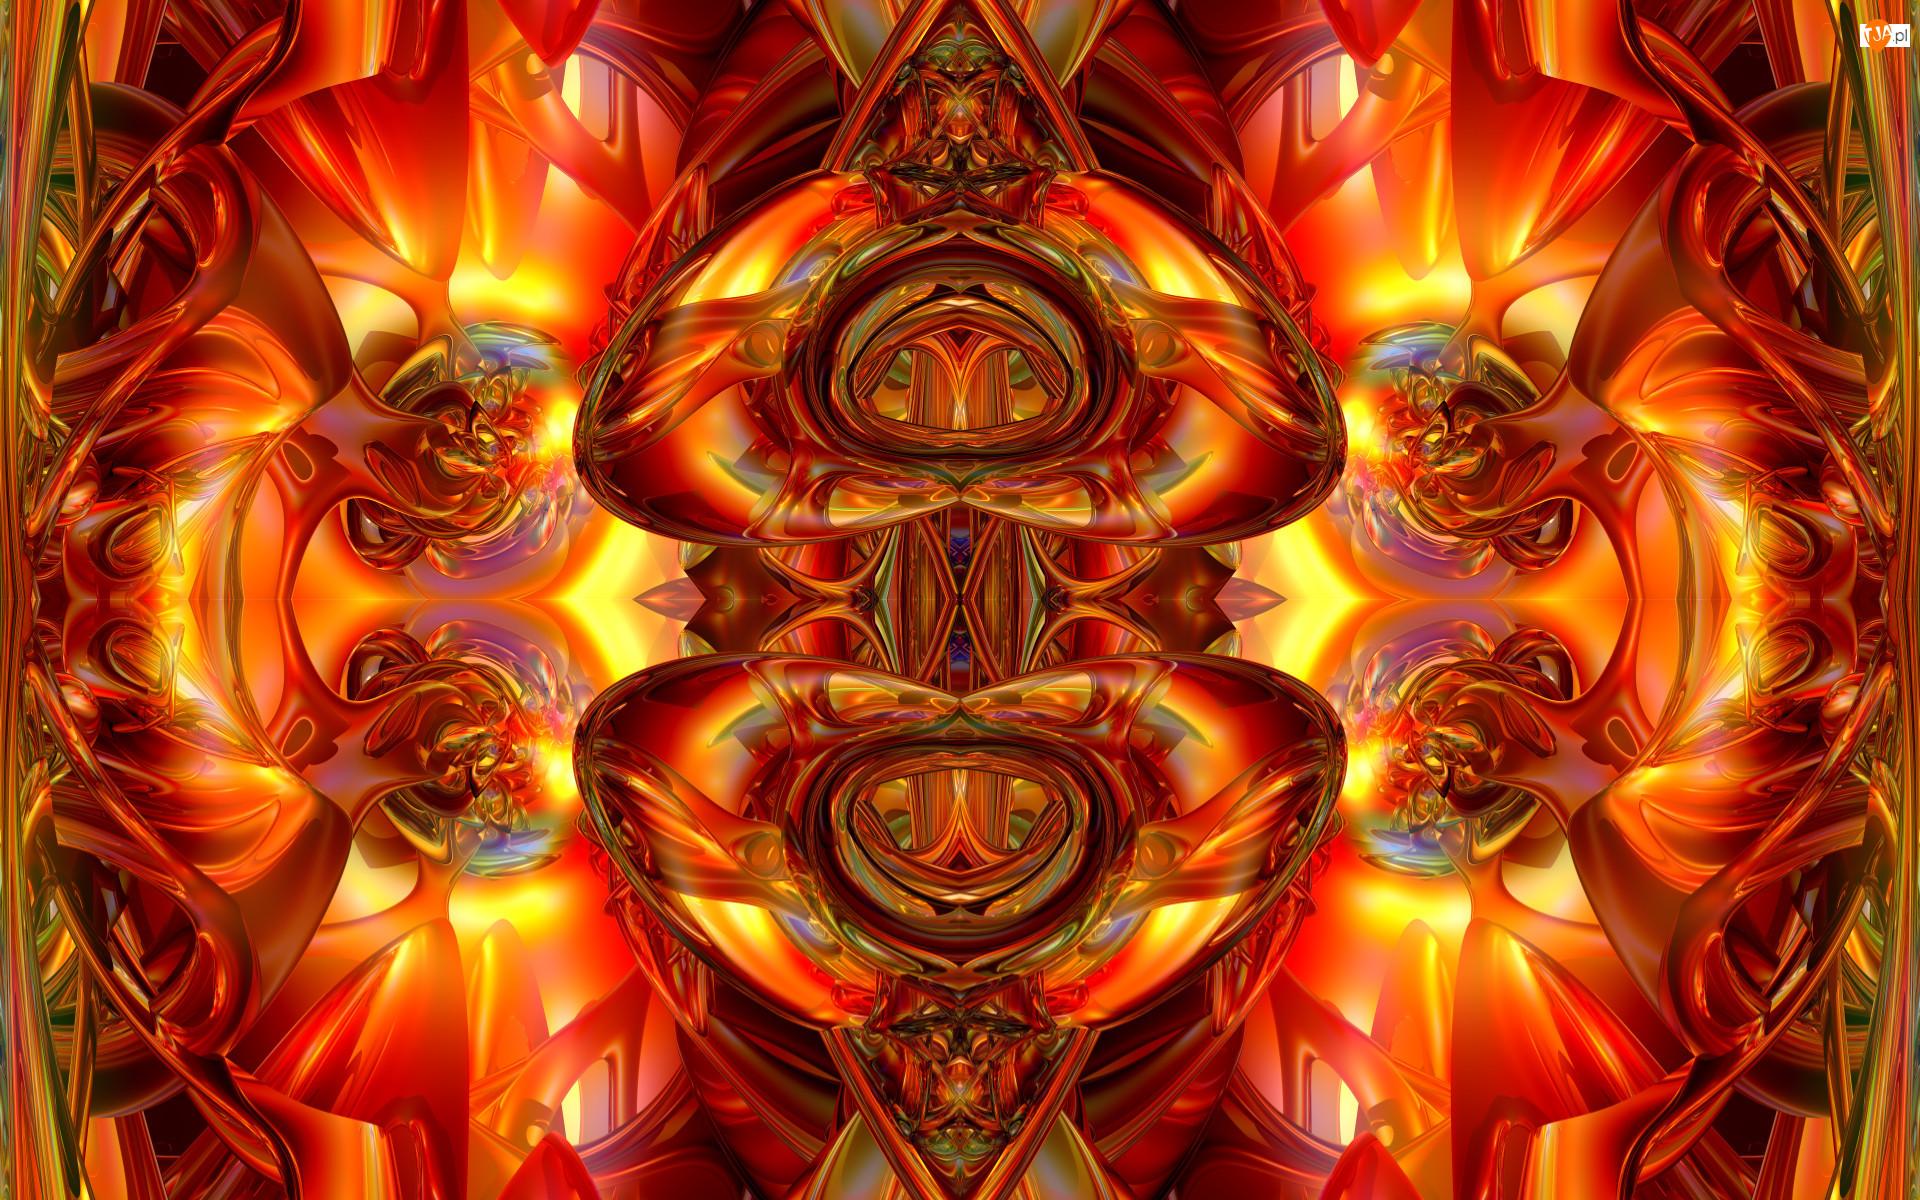 Wzory, Grafika 3D, Abstrakcja